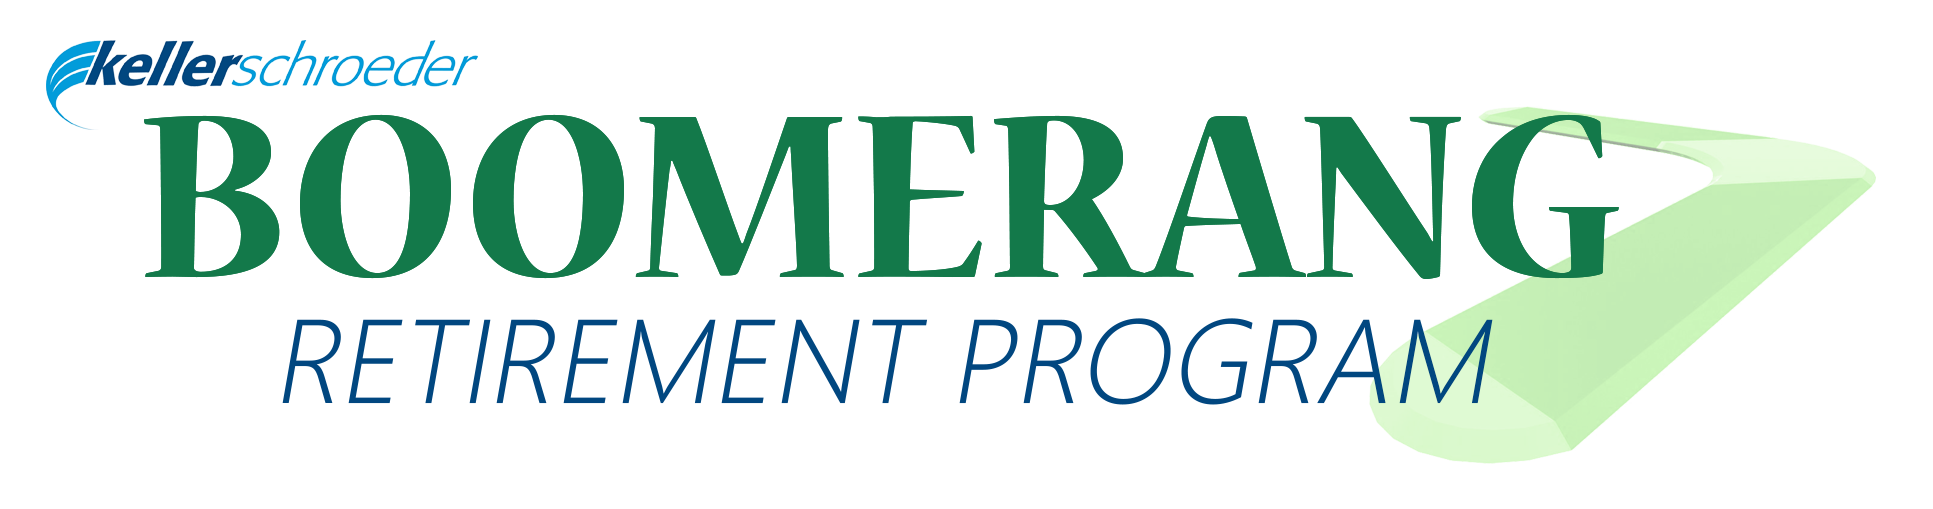 Boomerang Retirement Program Logo